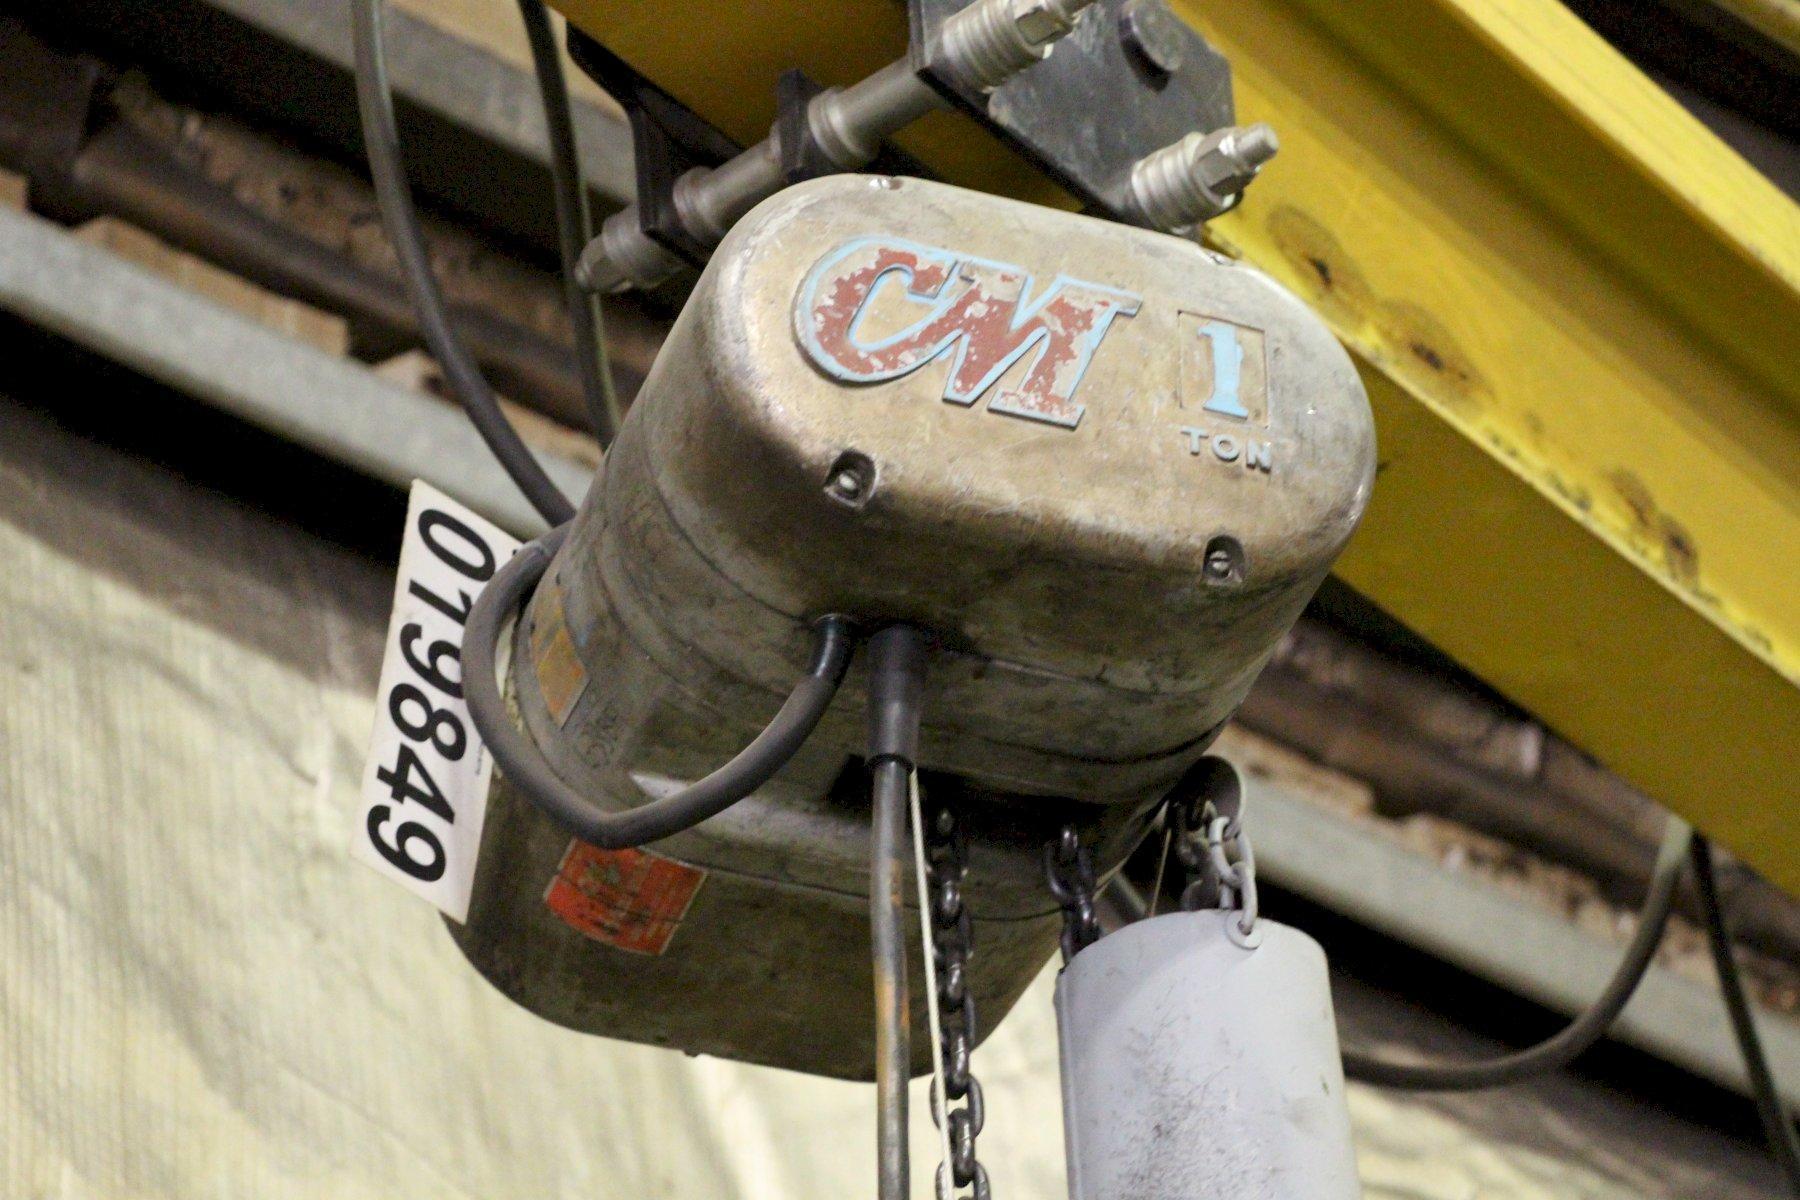 1 TON CM LODESTAR ELECTRIC POWER CHAIN HOIST: STOCK #11236